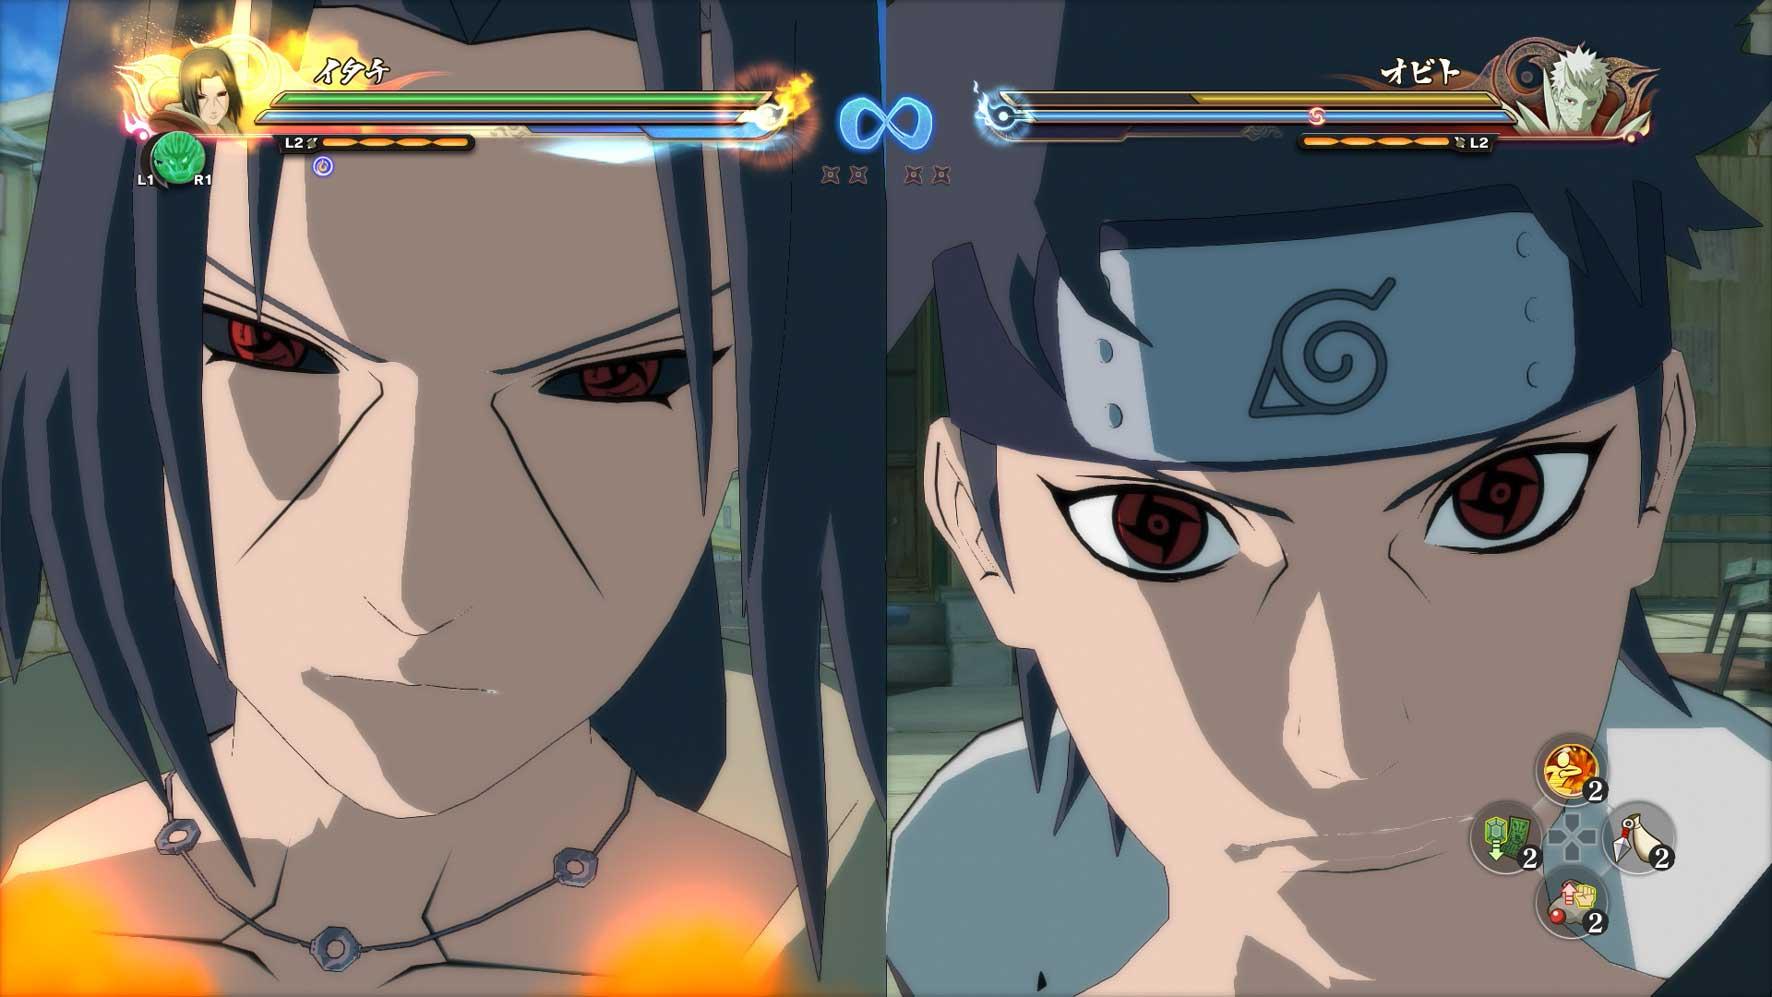 Descargar Gratis Juego Naruto Shippuden Ultimate Ninja 6